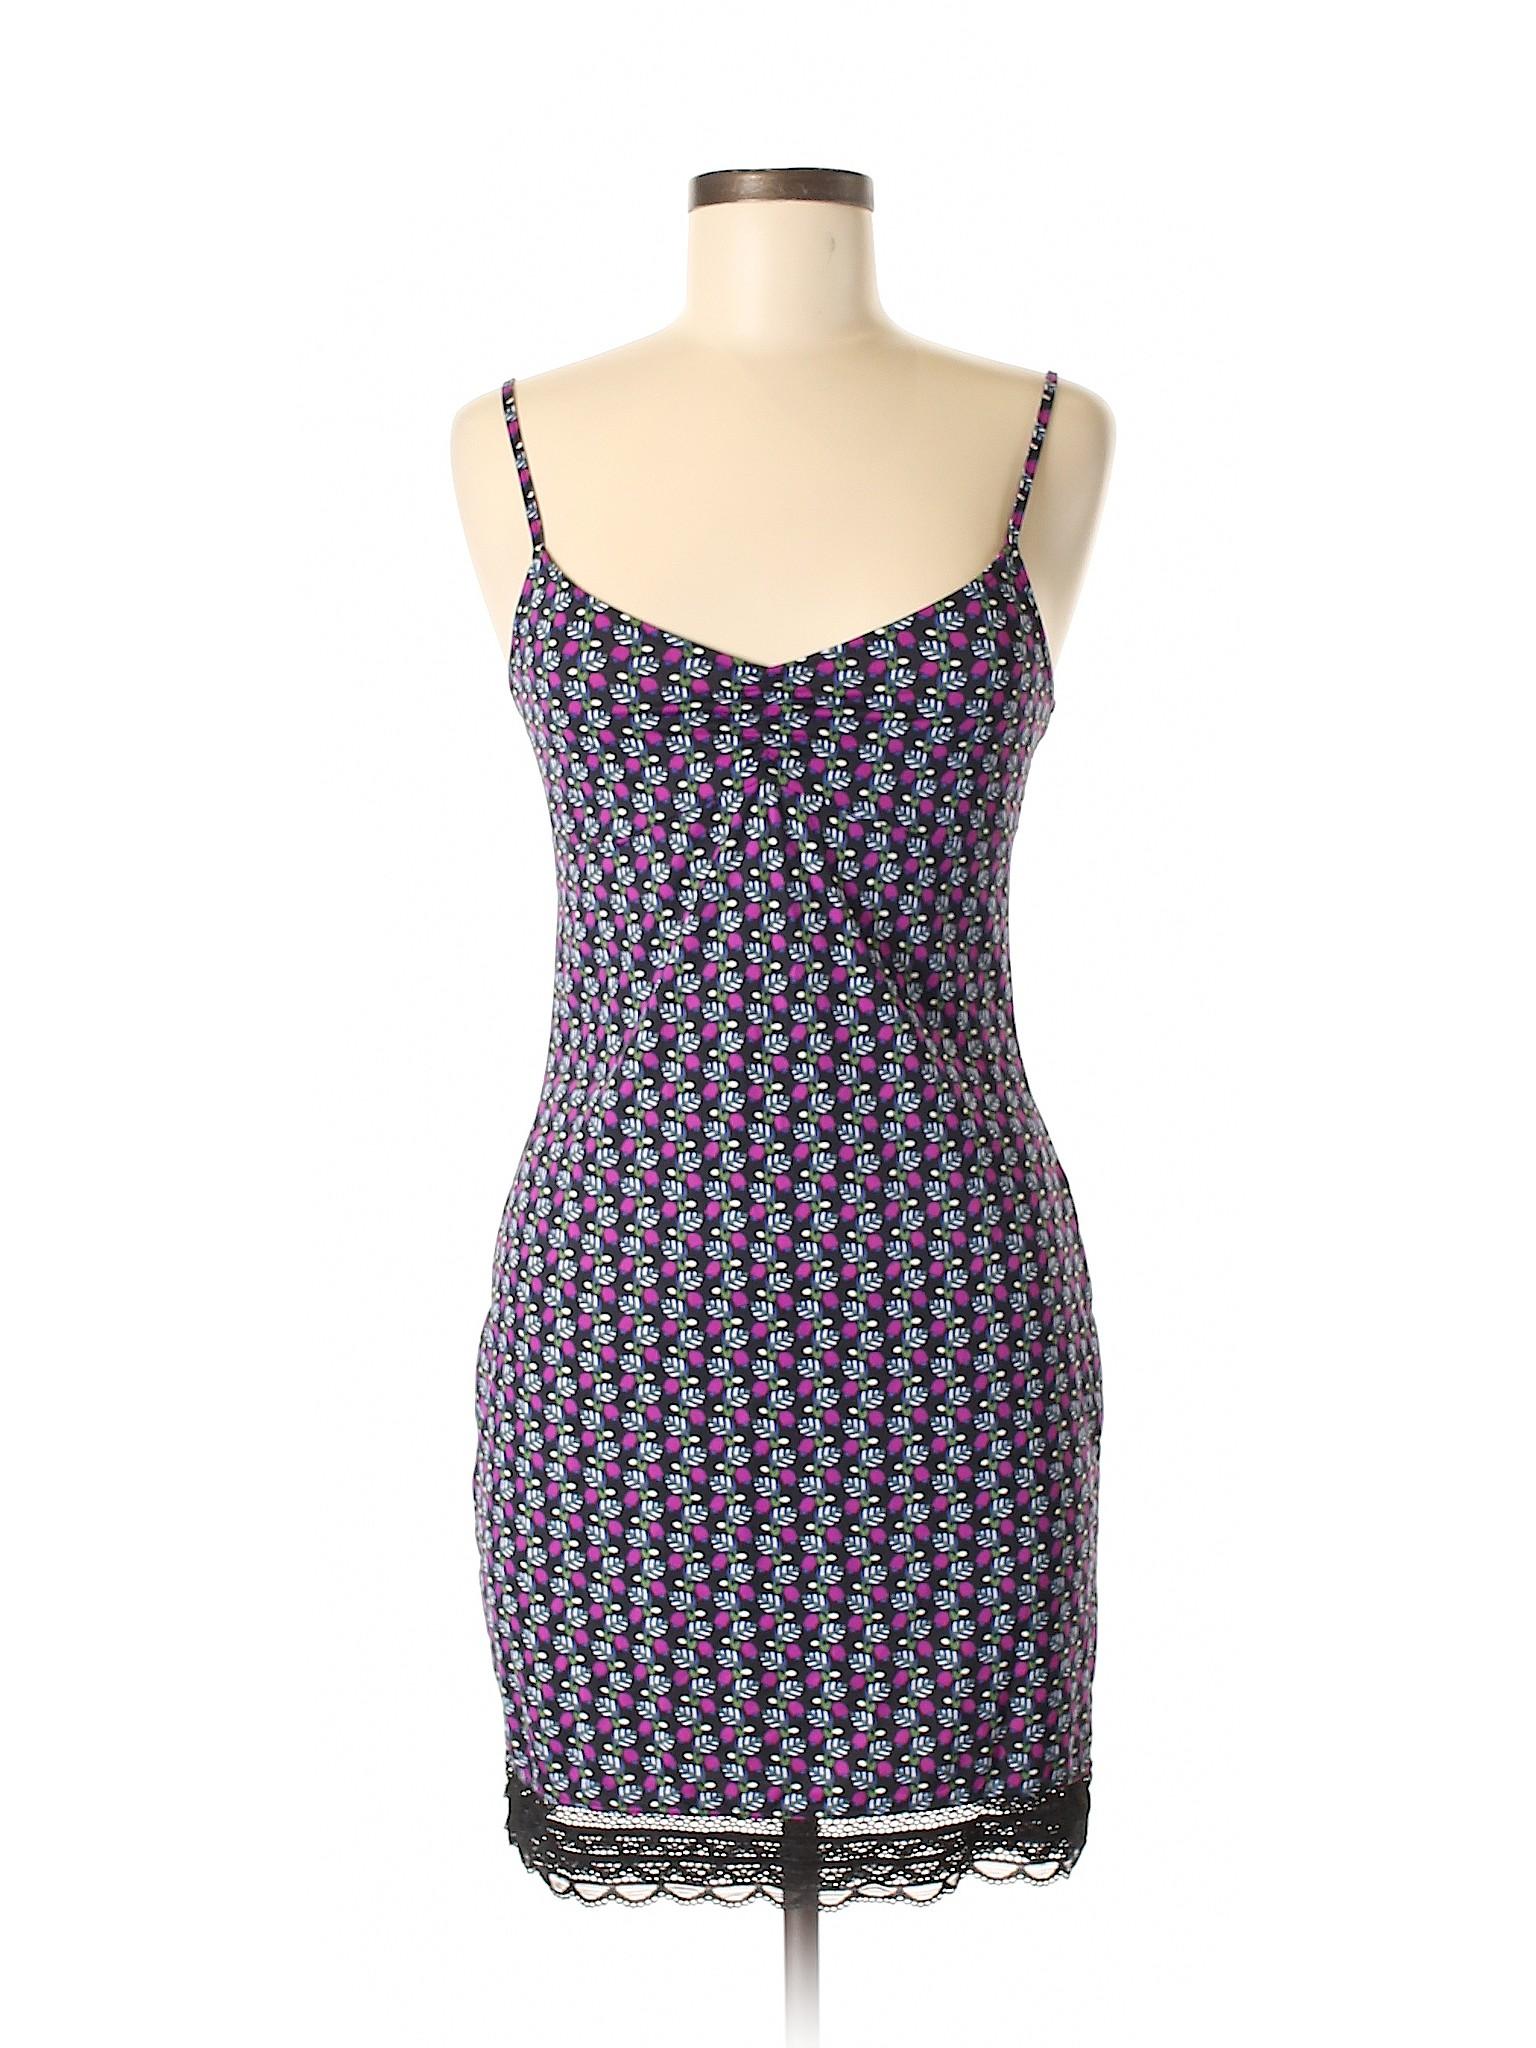 Casual Selling Dress Selling Eloise Eloise t8qHxB6